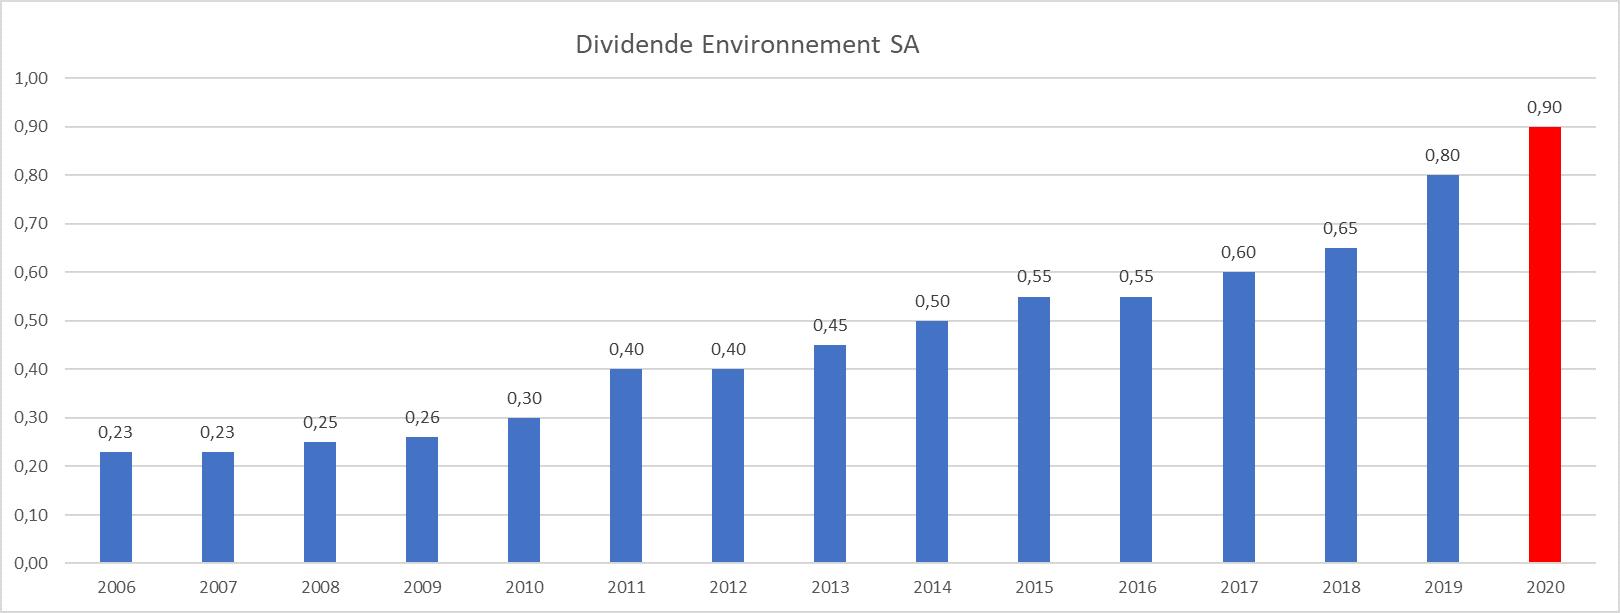 Presque Dividend Aristocrats France Environnement SA